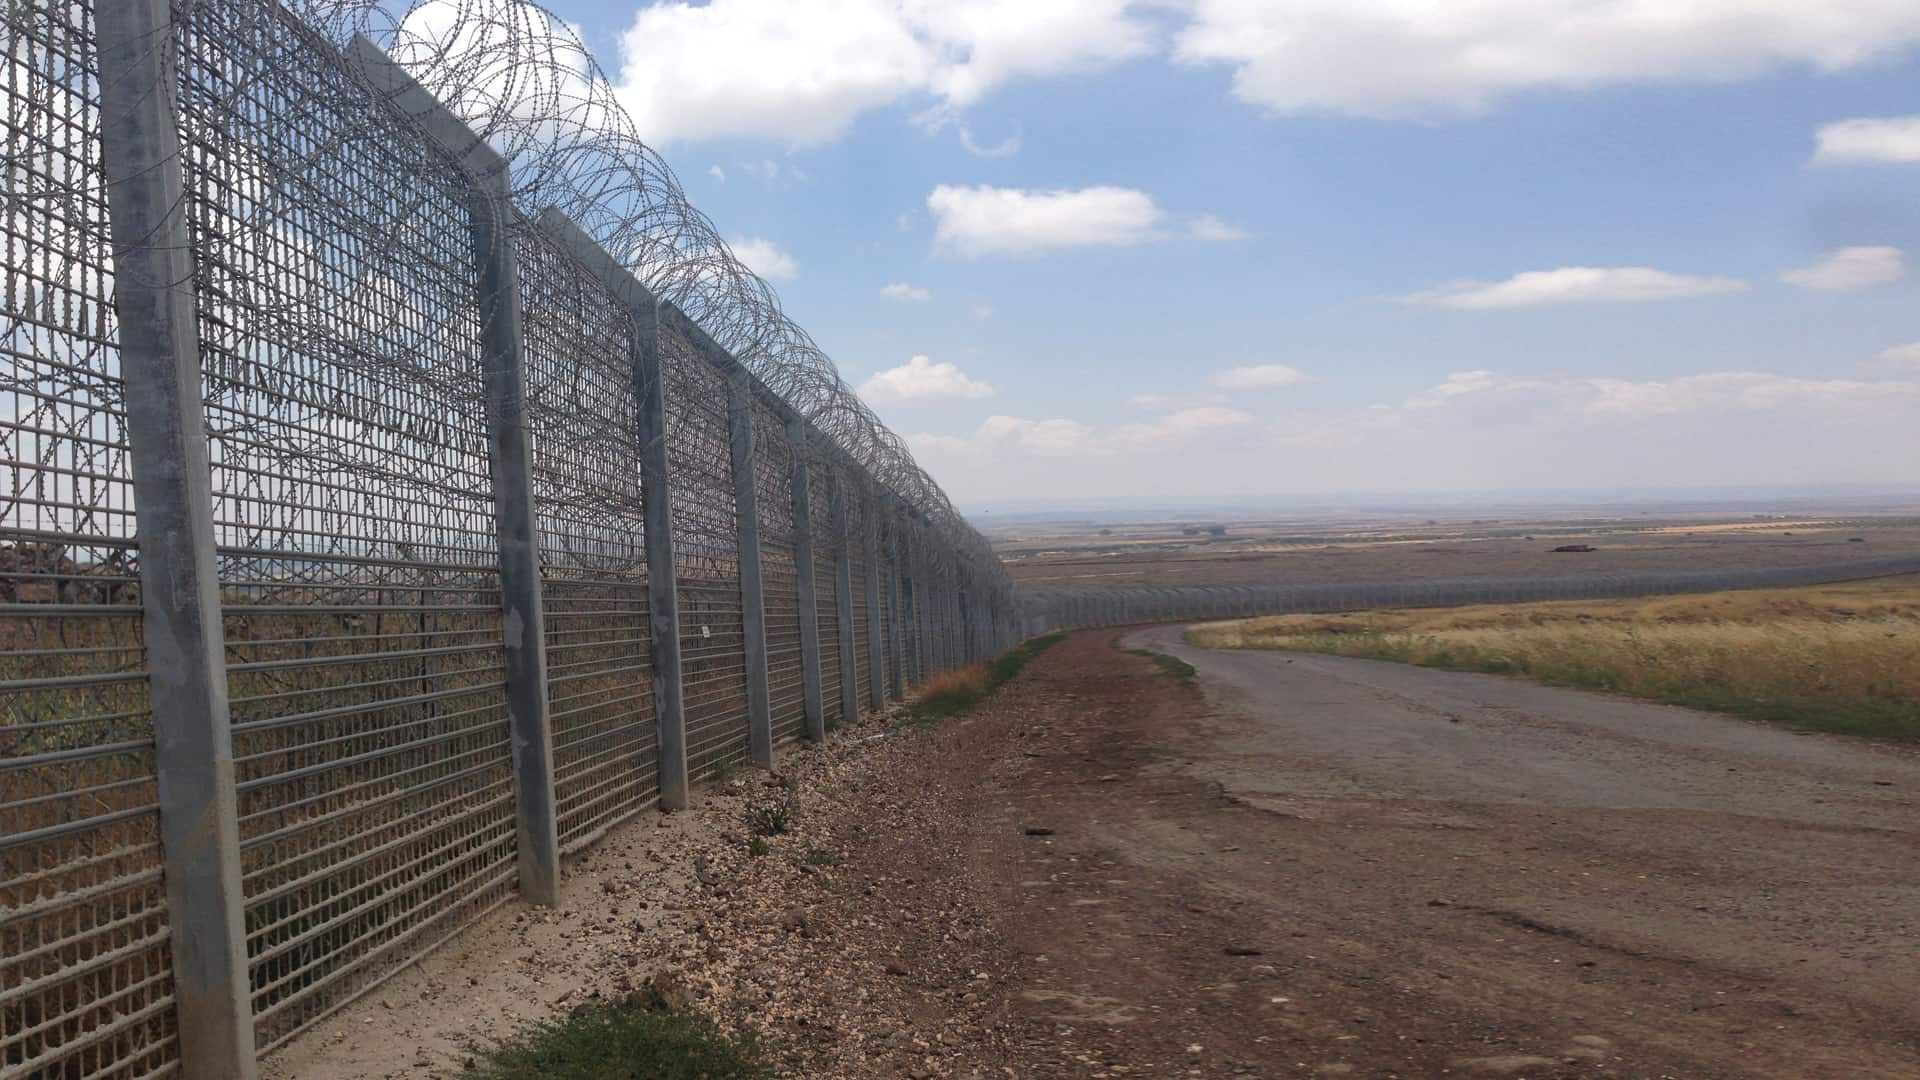 Fences Amp Smart Barriers Mifram Security